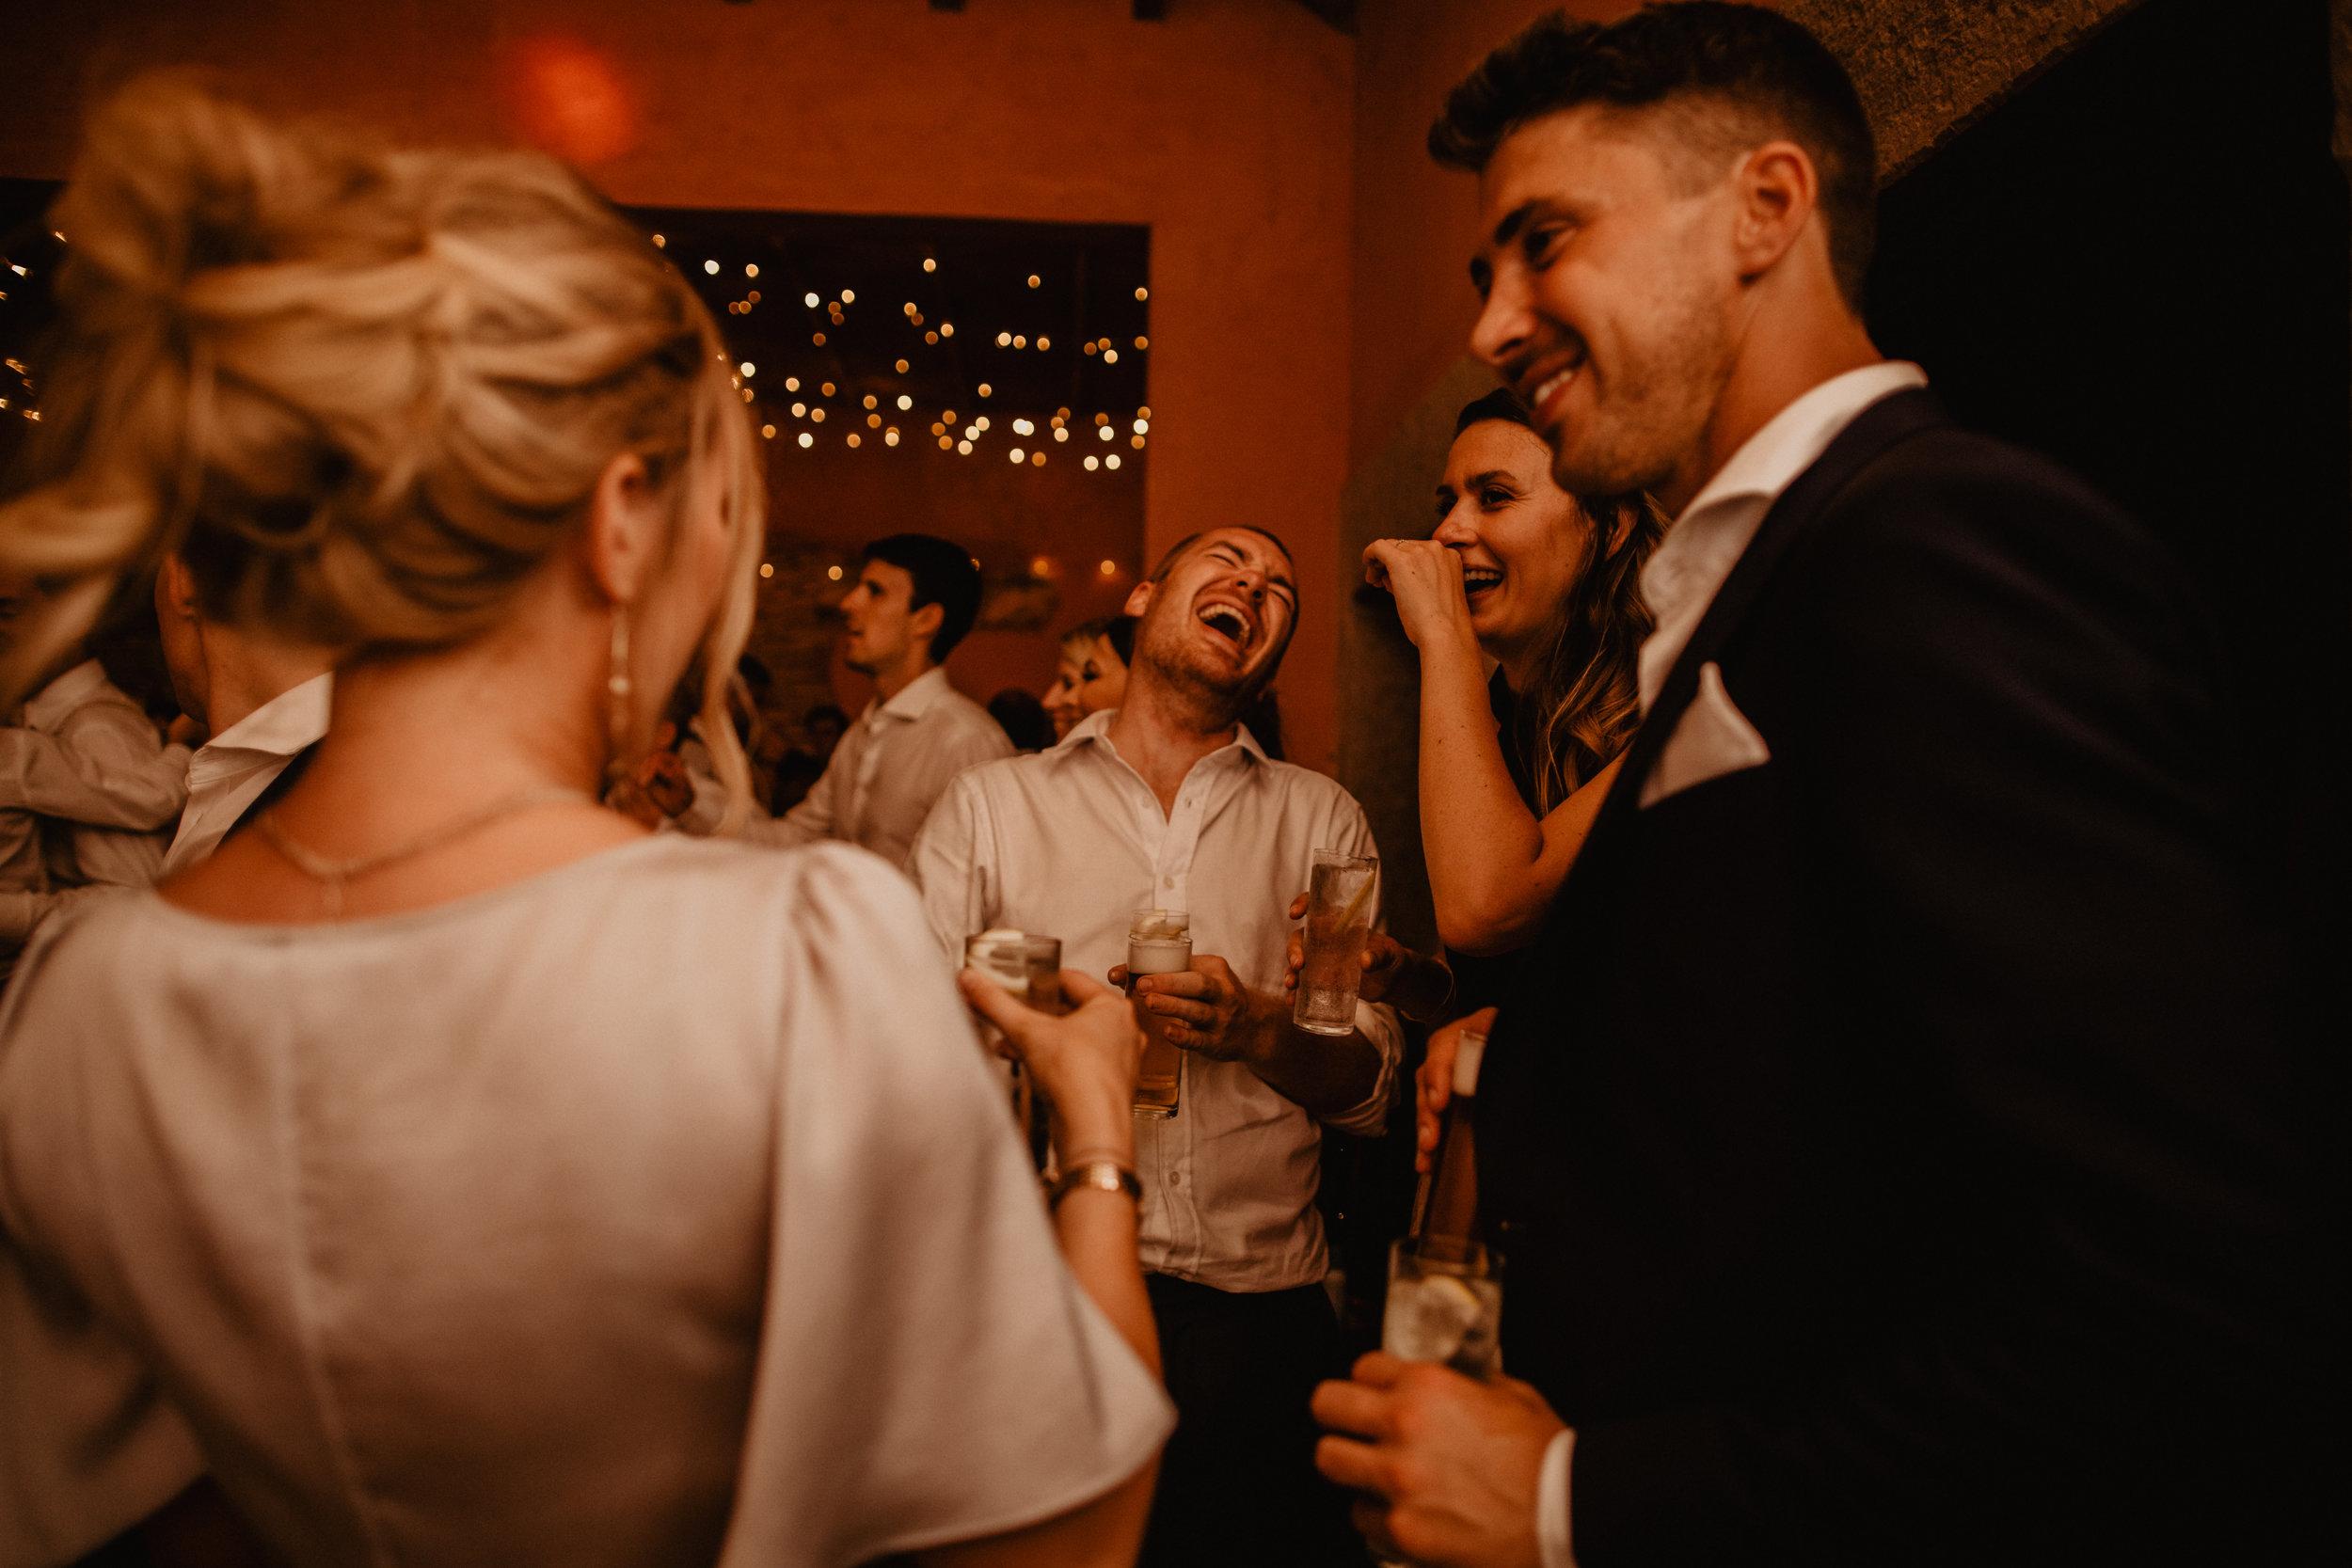 Lapela-photography-wedding-sintra-portugal-133.jpg